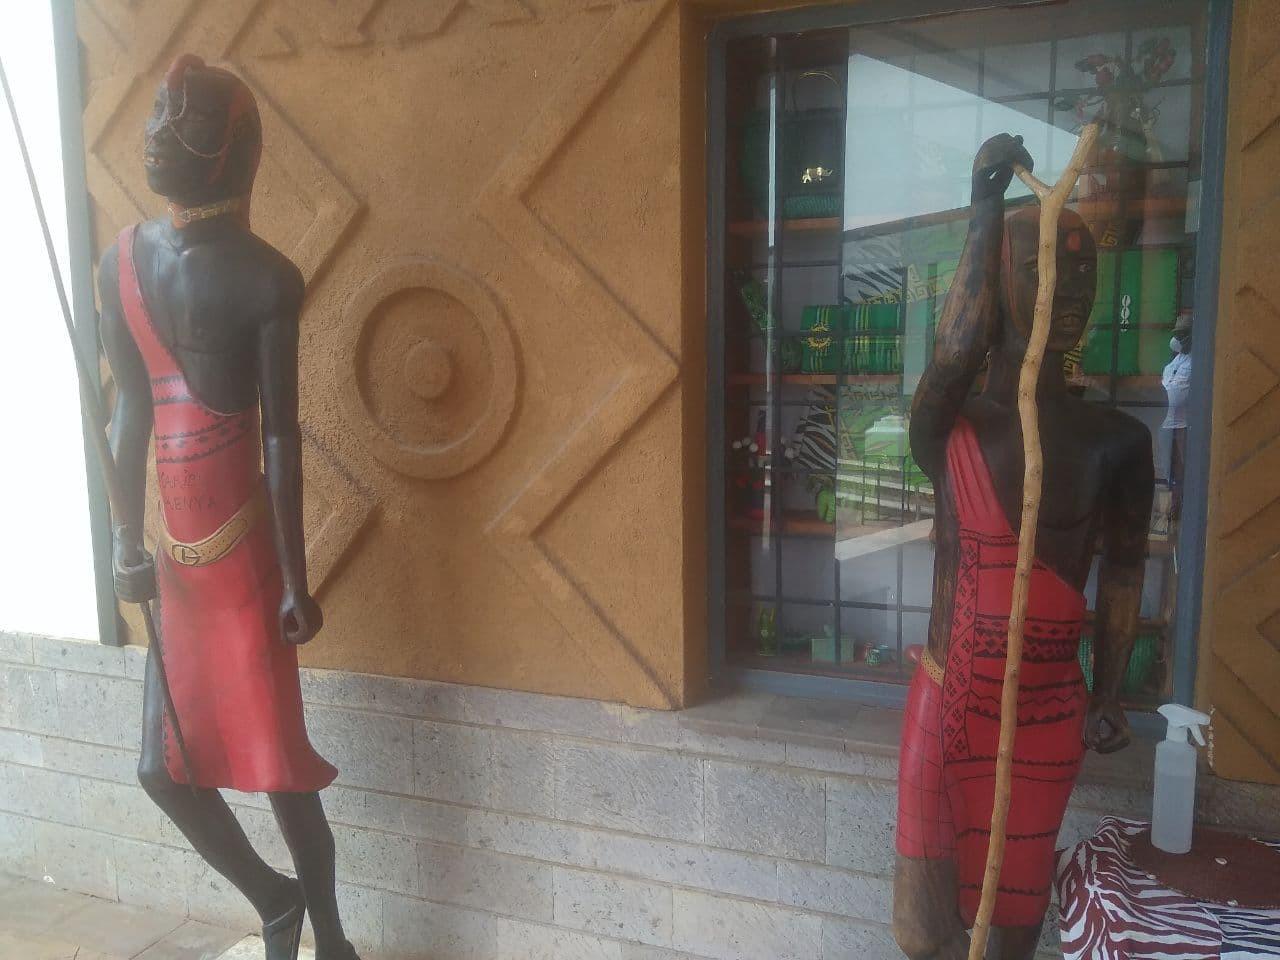 7Q7RU Nairobi, Kenya National Musem 9 November 2020 Image 12